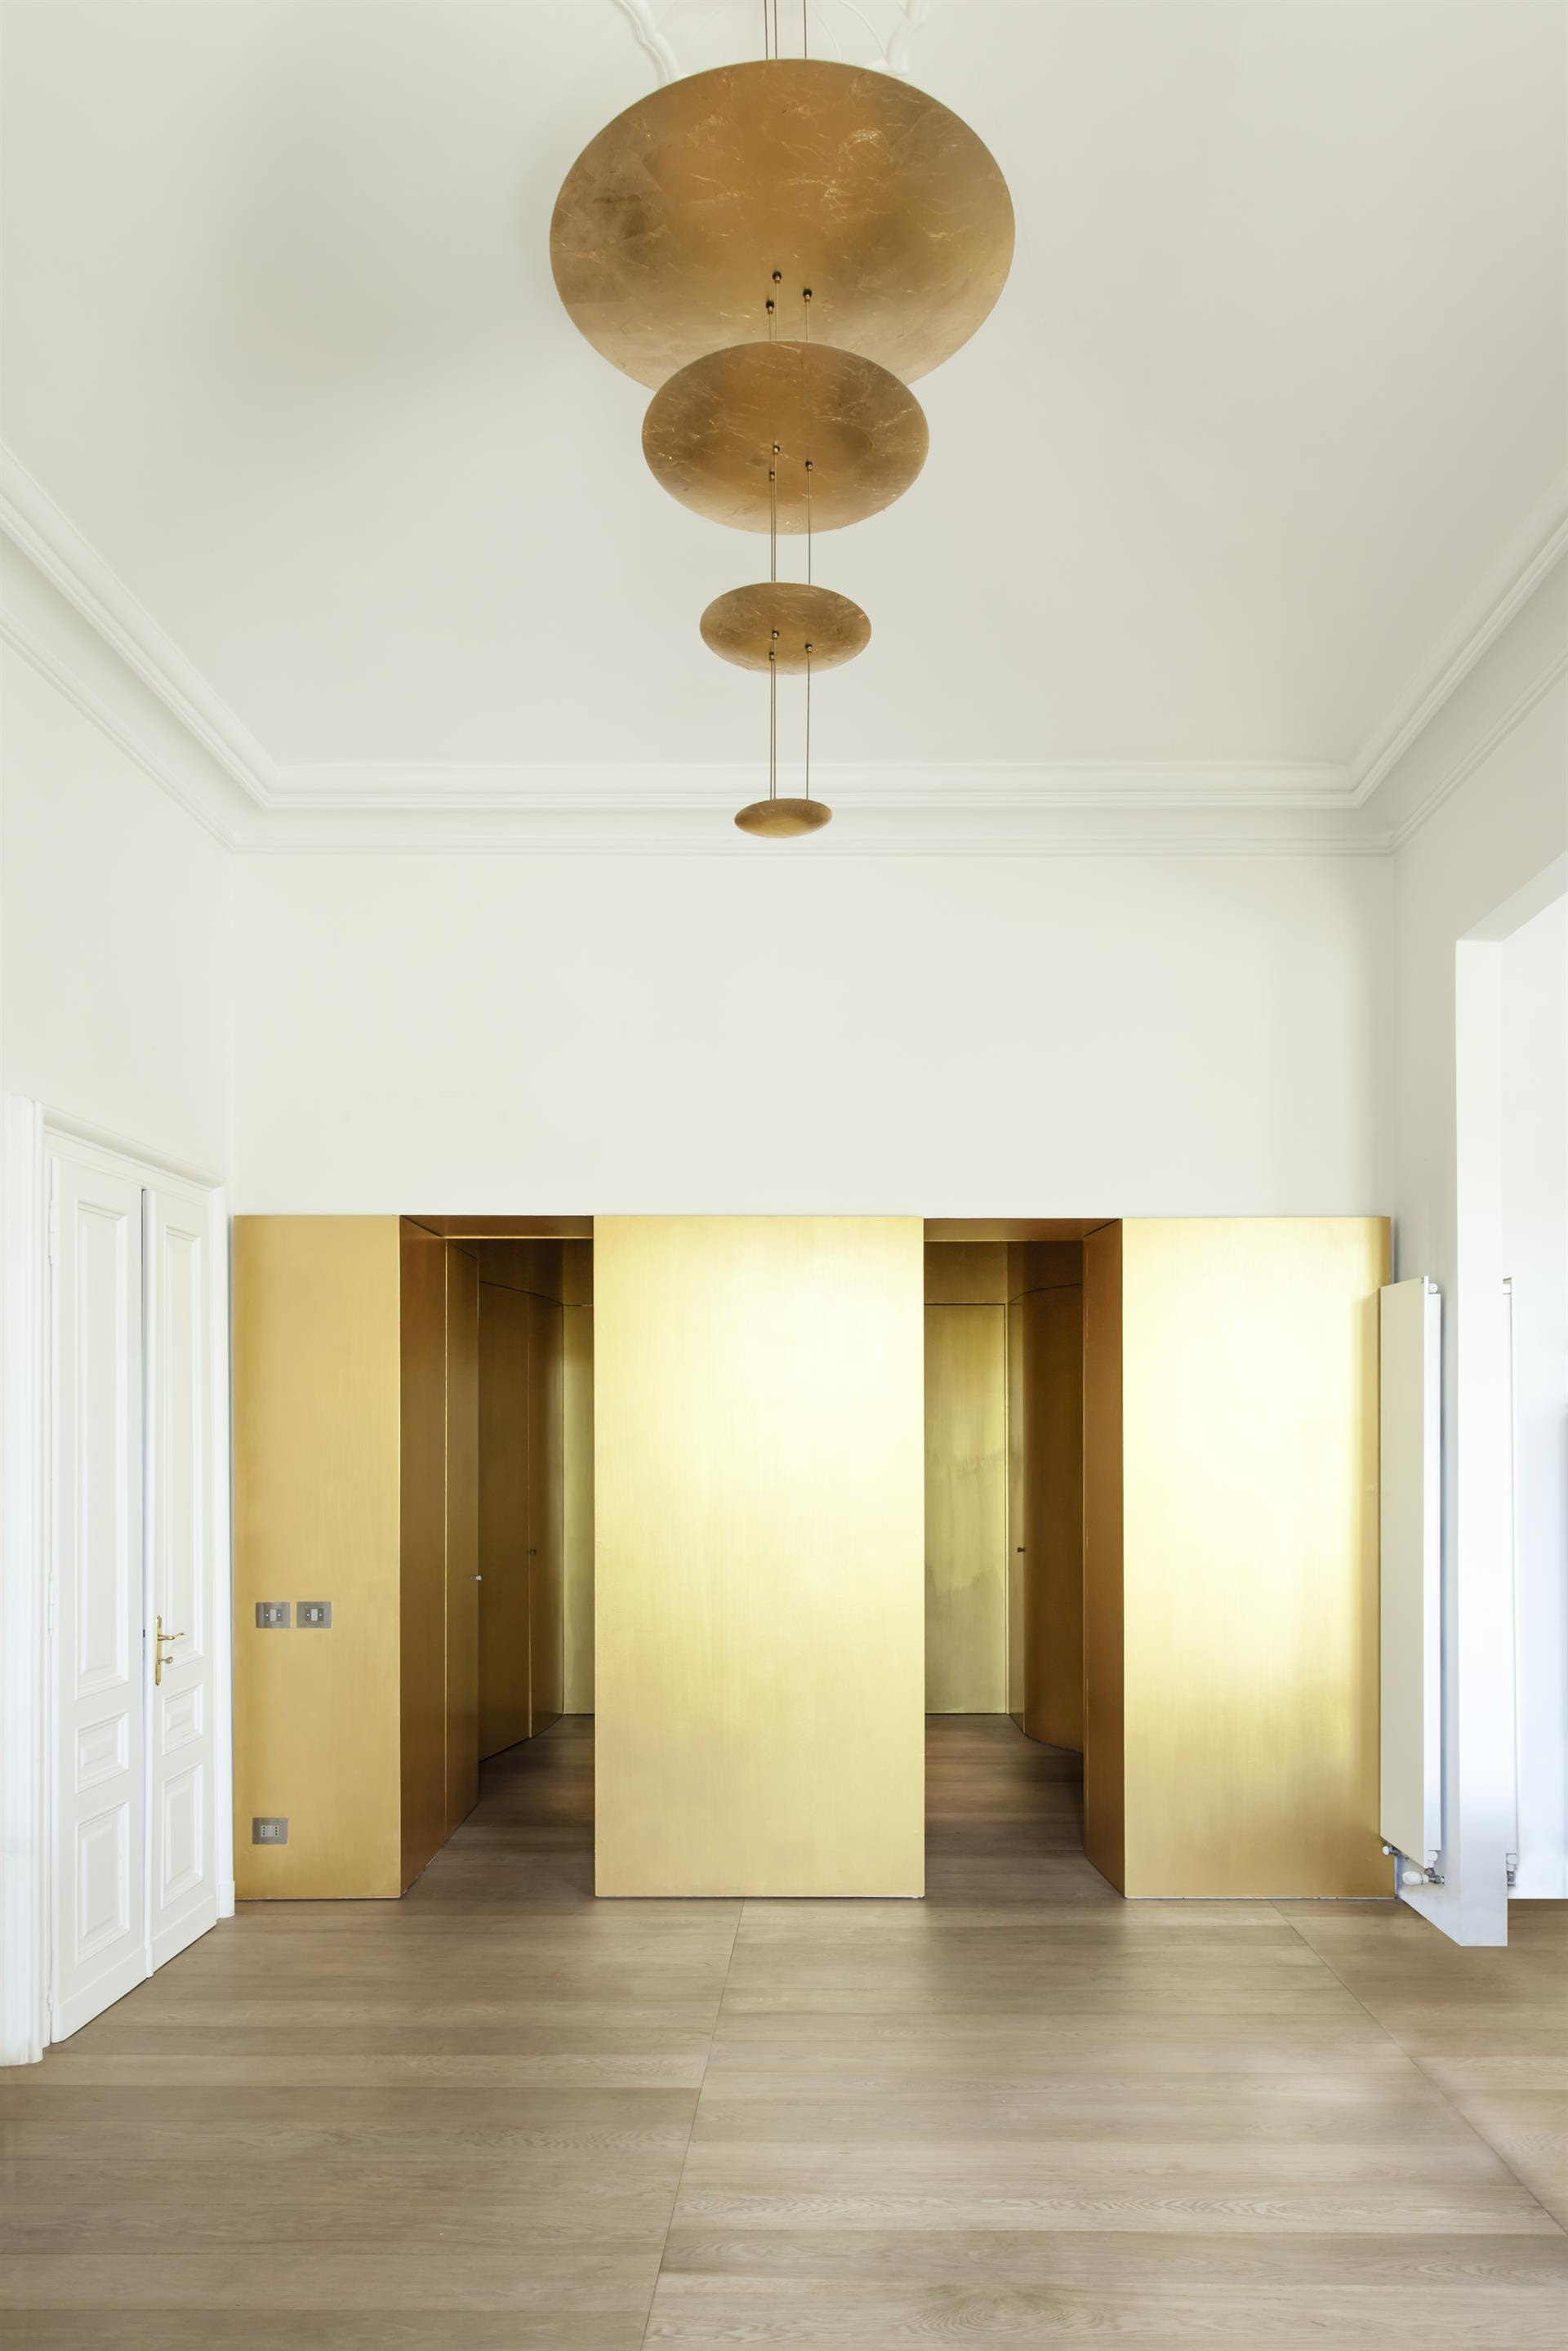 catellani-entryway-lights-isolina-mallon-interiors